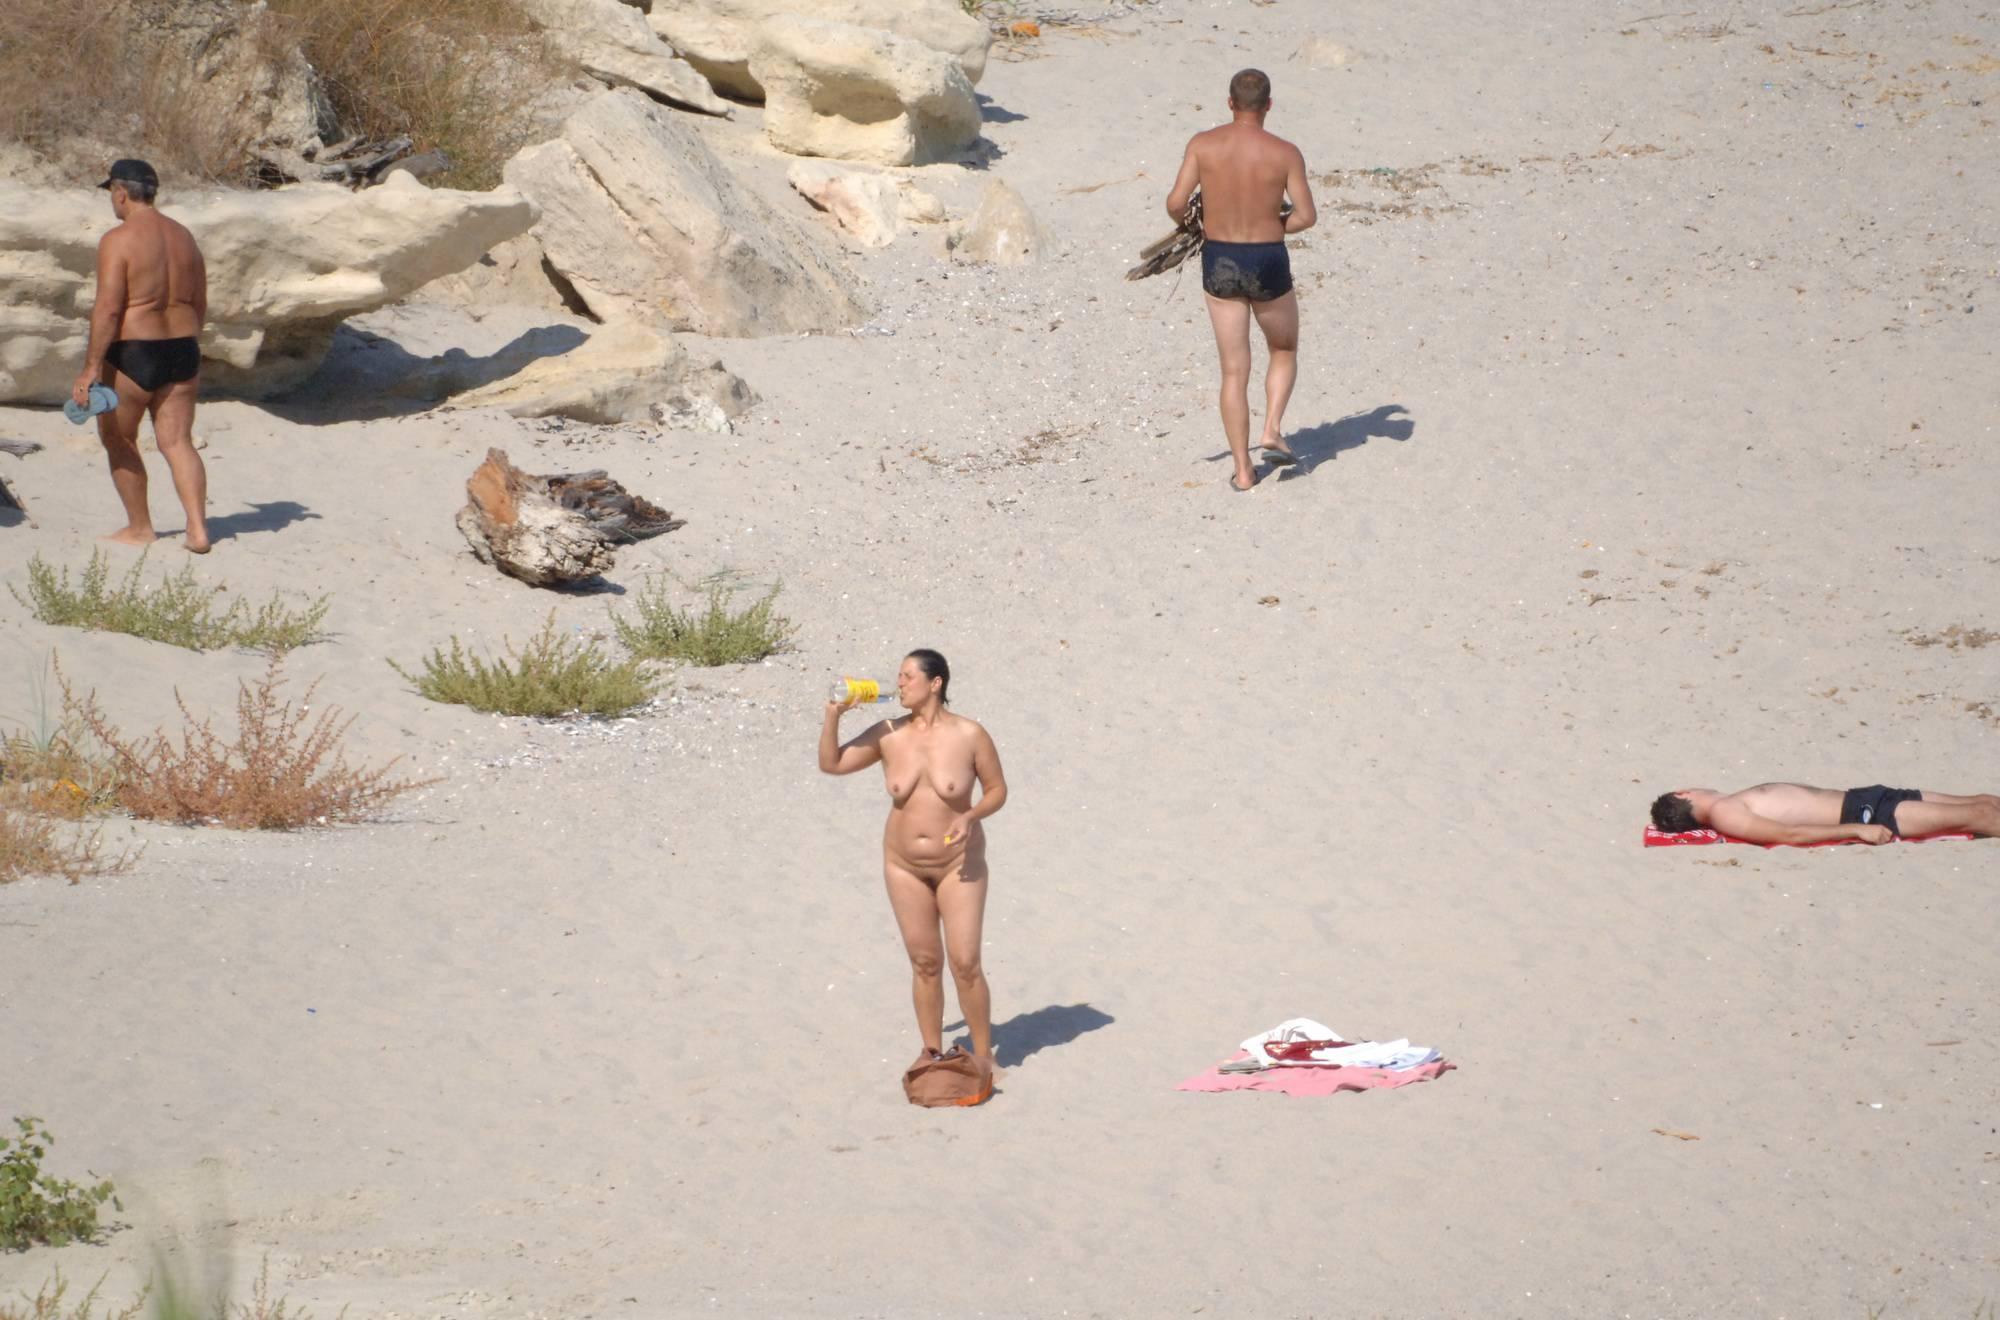 Nudist Gallery Verna Beach Far Overview - 2